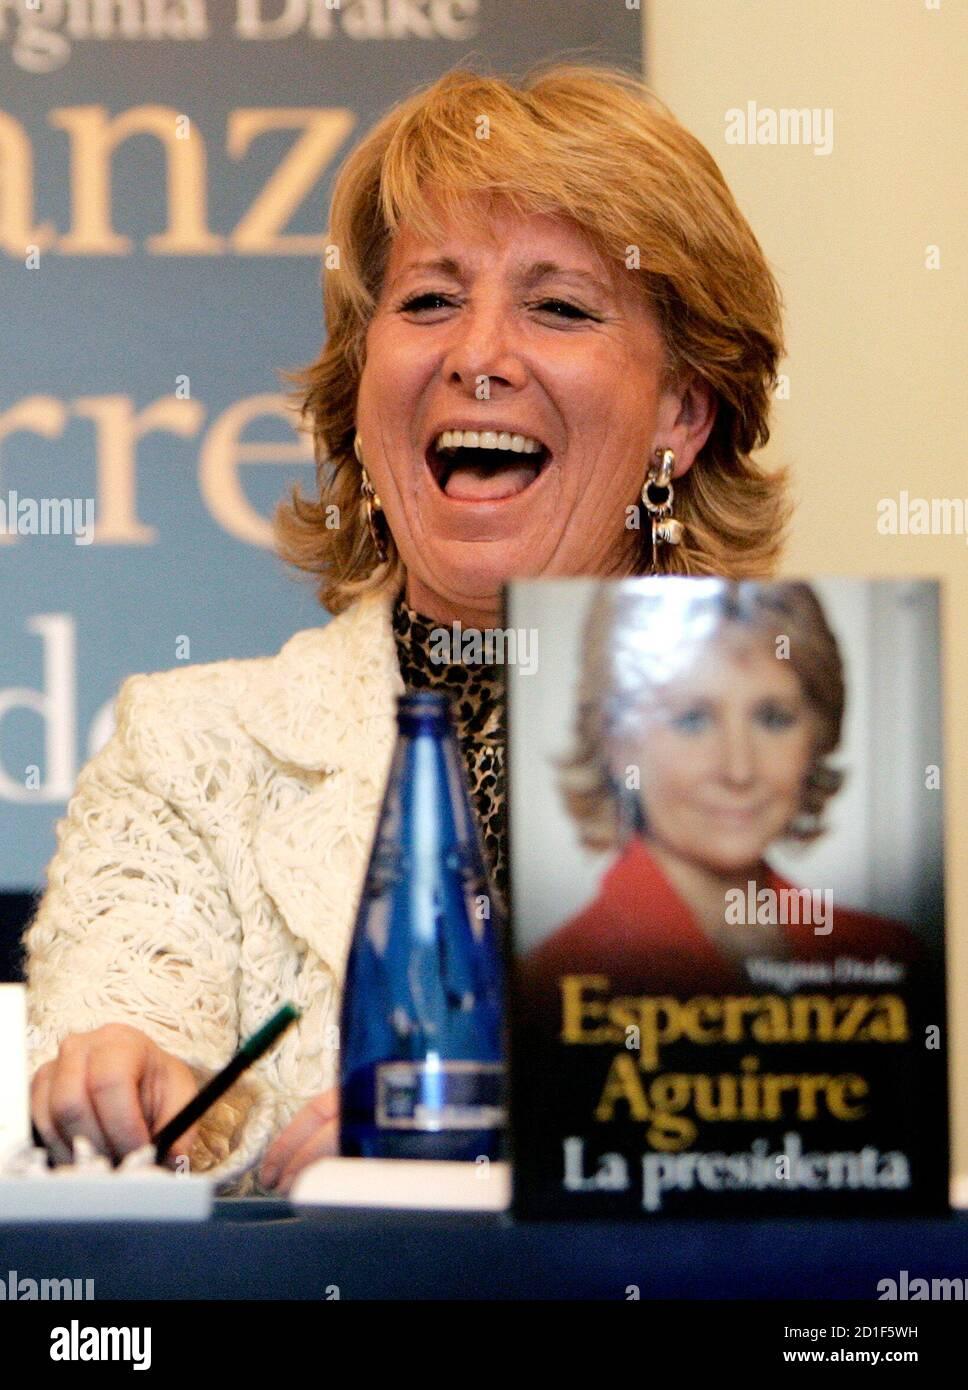 President of Madrid's regional government Esperanza Aguirre laughs during the presentation of her biography 'Esperanza Aguirre La Presidenta' in Madrid November 28, 2006.  REUTERS/Andrea Comas  (SPAIN) Foto de stock